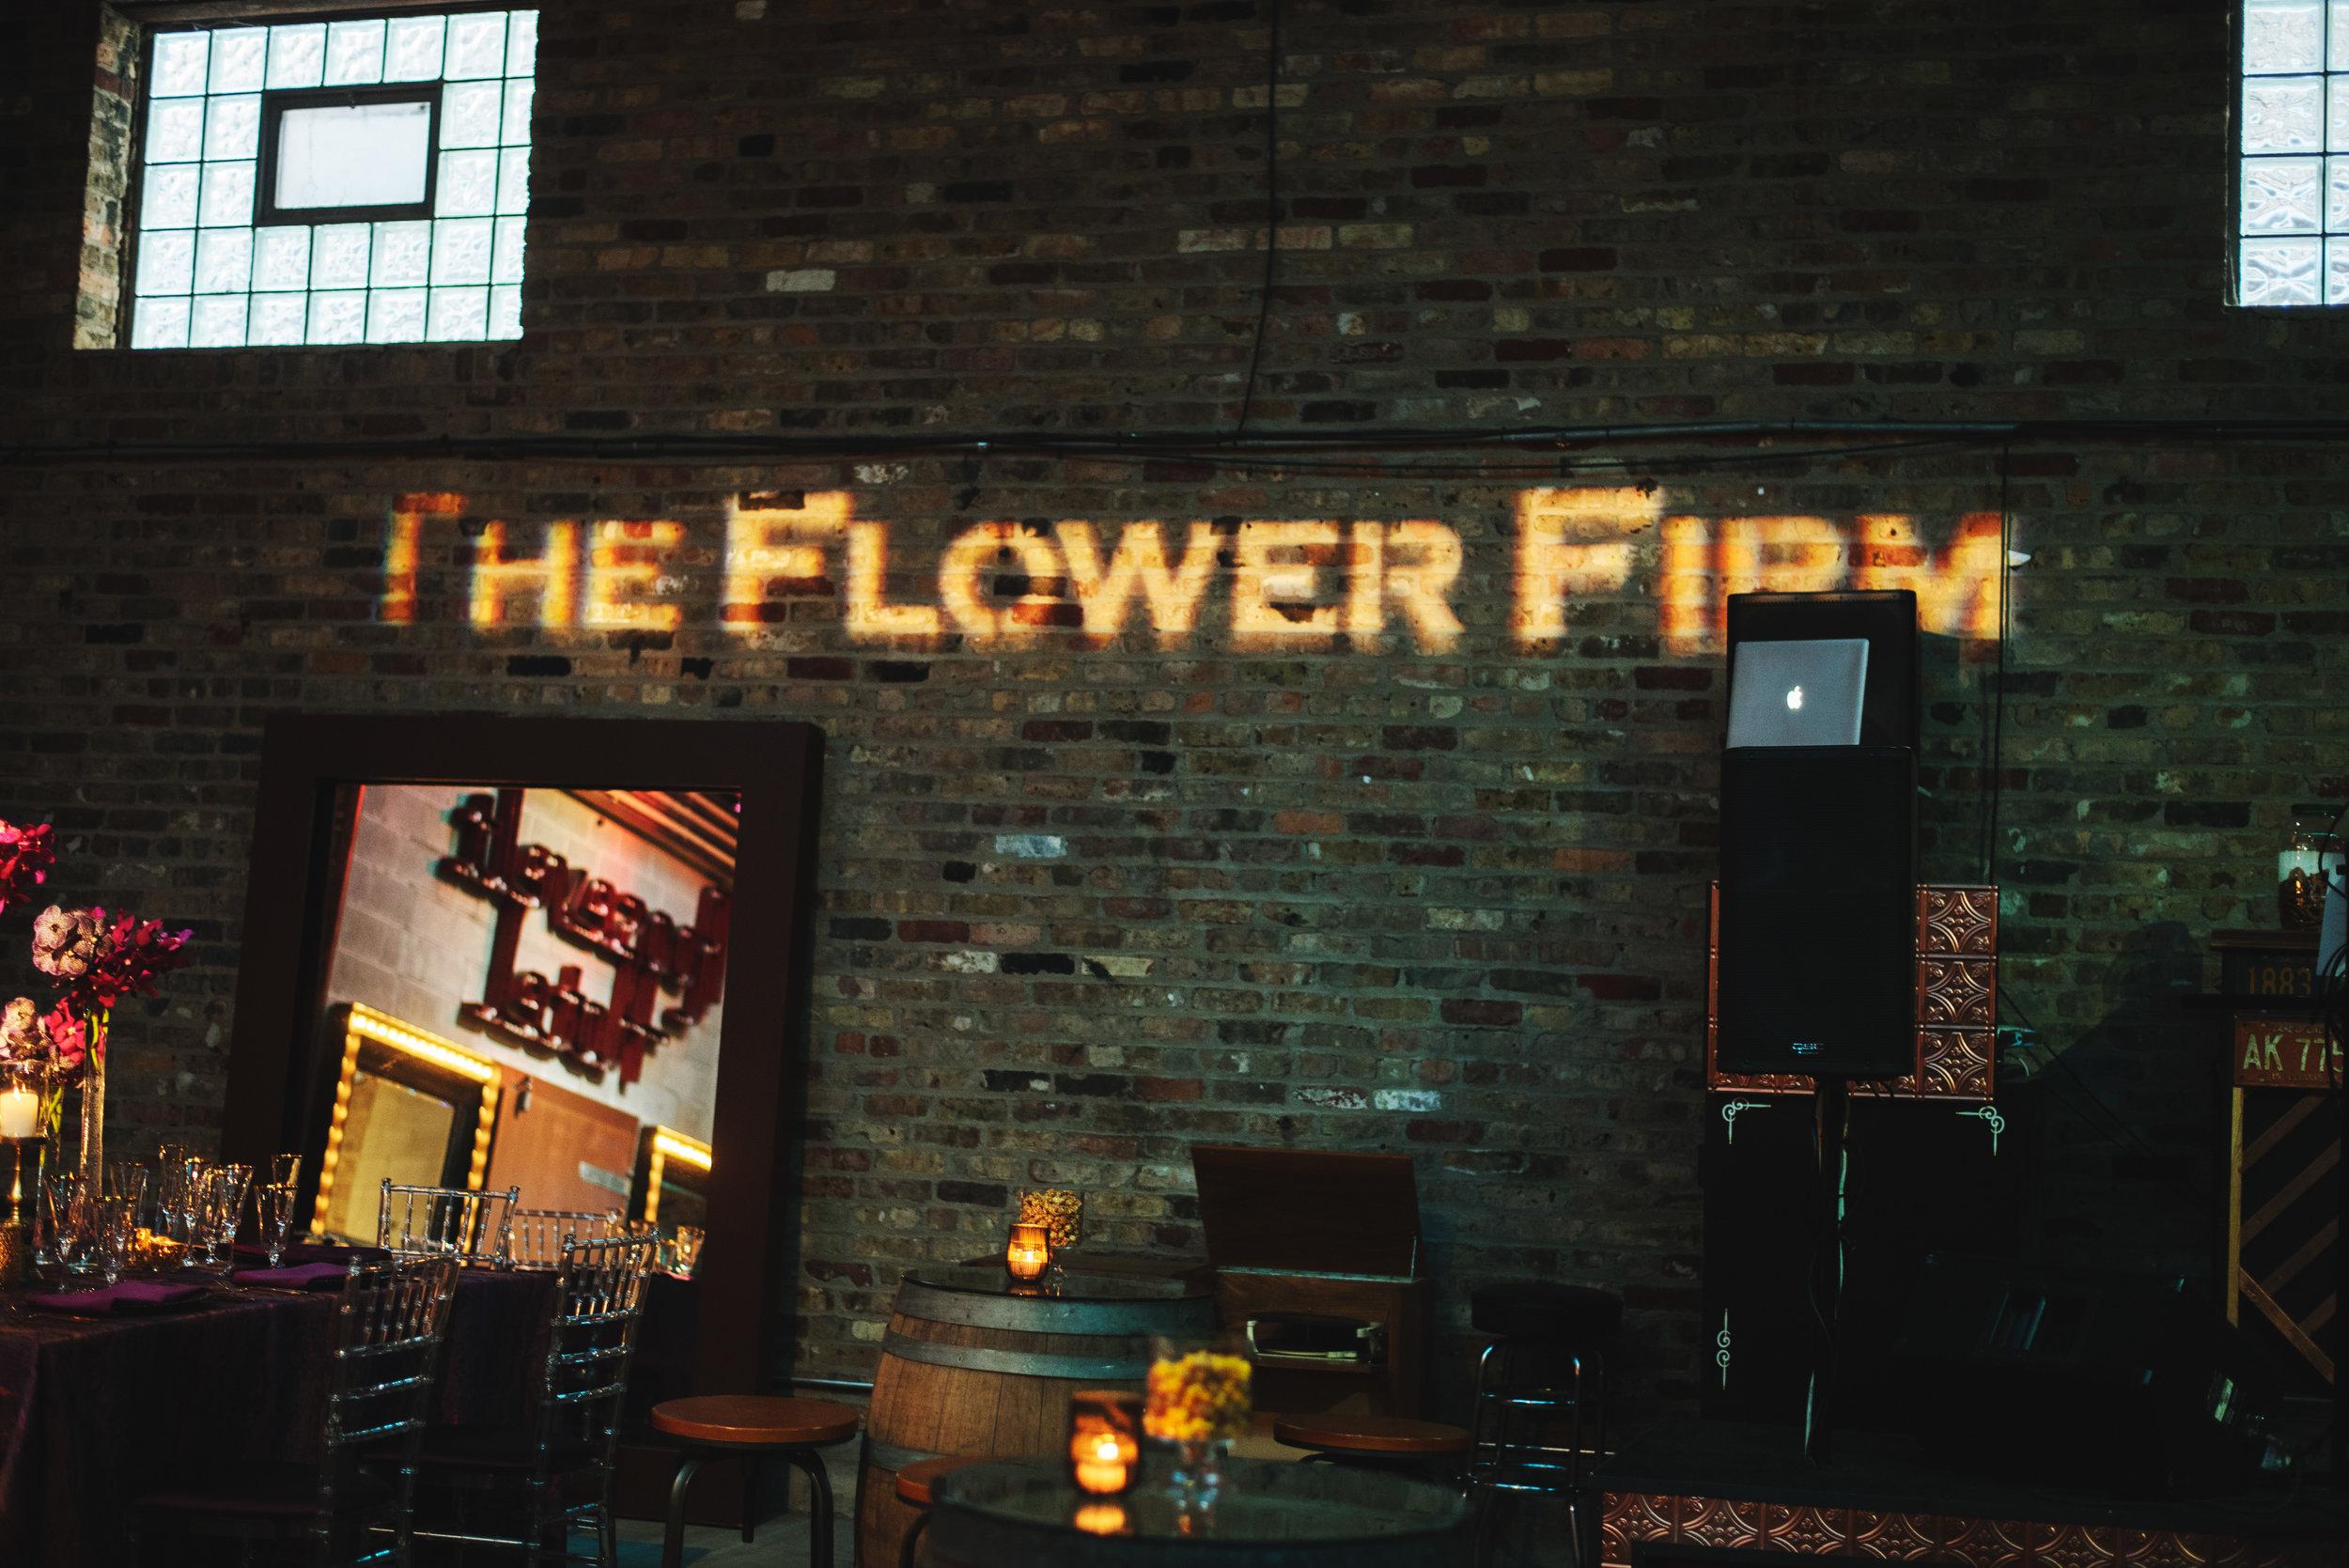 TheFlowerFirm-Event-Chicago00004.jpg